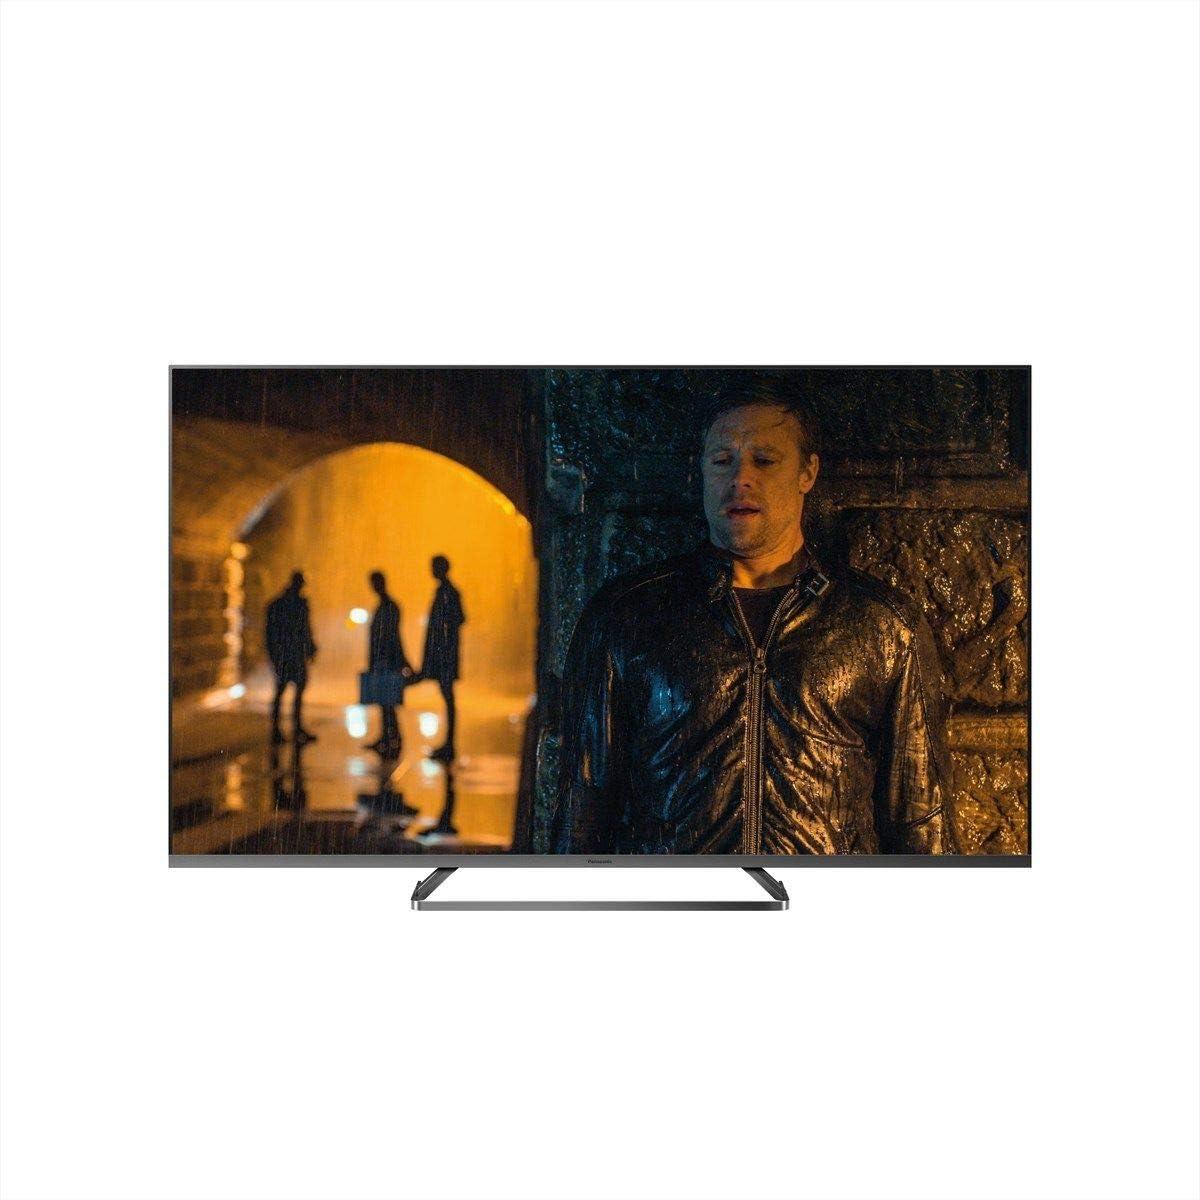 Panasonic ® - TV Led 126 Cm (50) Panasonic Tx-50Gx810E Uhd 4K HDR, Smart TV, Procesador Hcx: Amazon.es: Electrónica